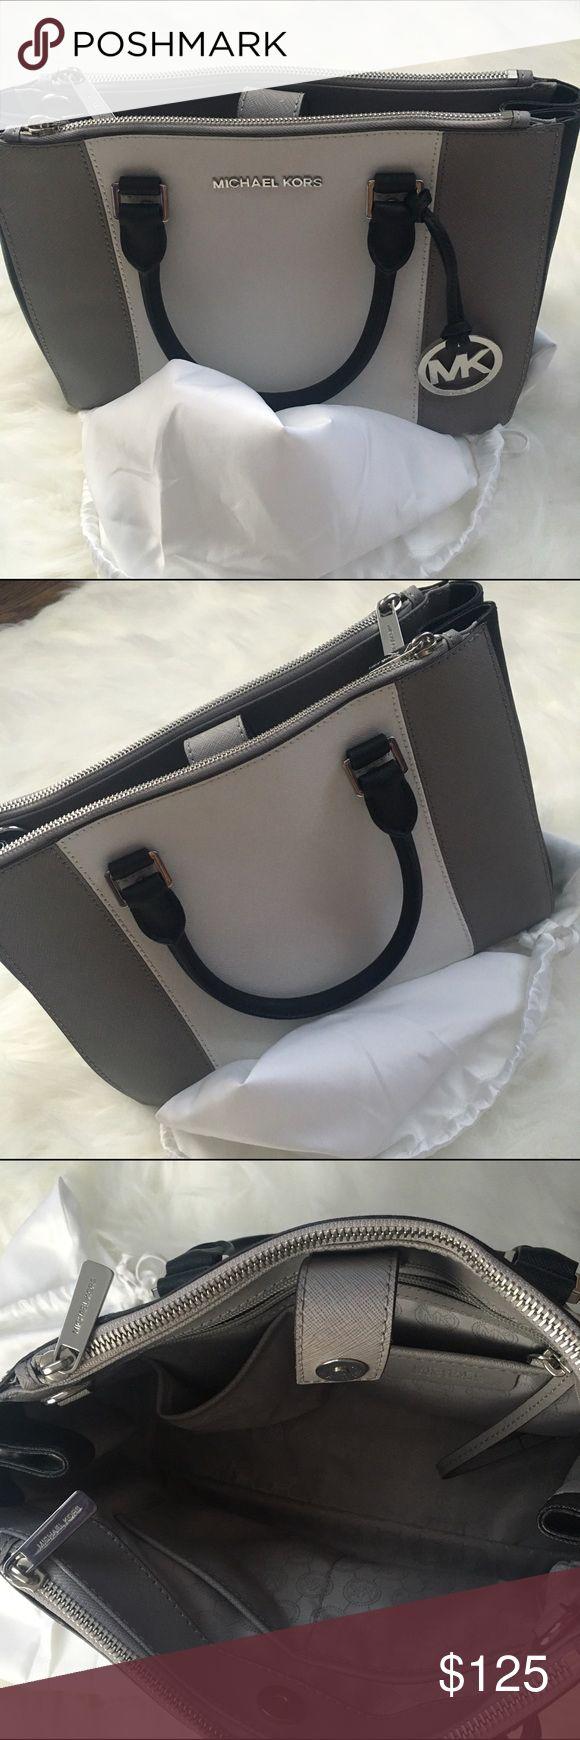 michael kors sales associate dress code michael kors warehouse sales handbags